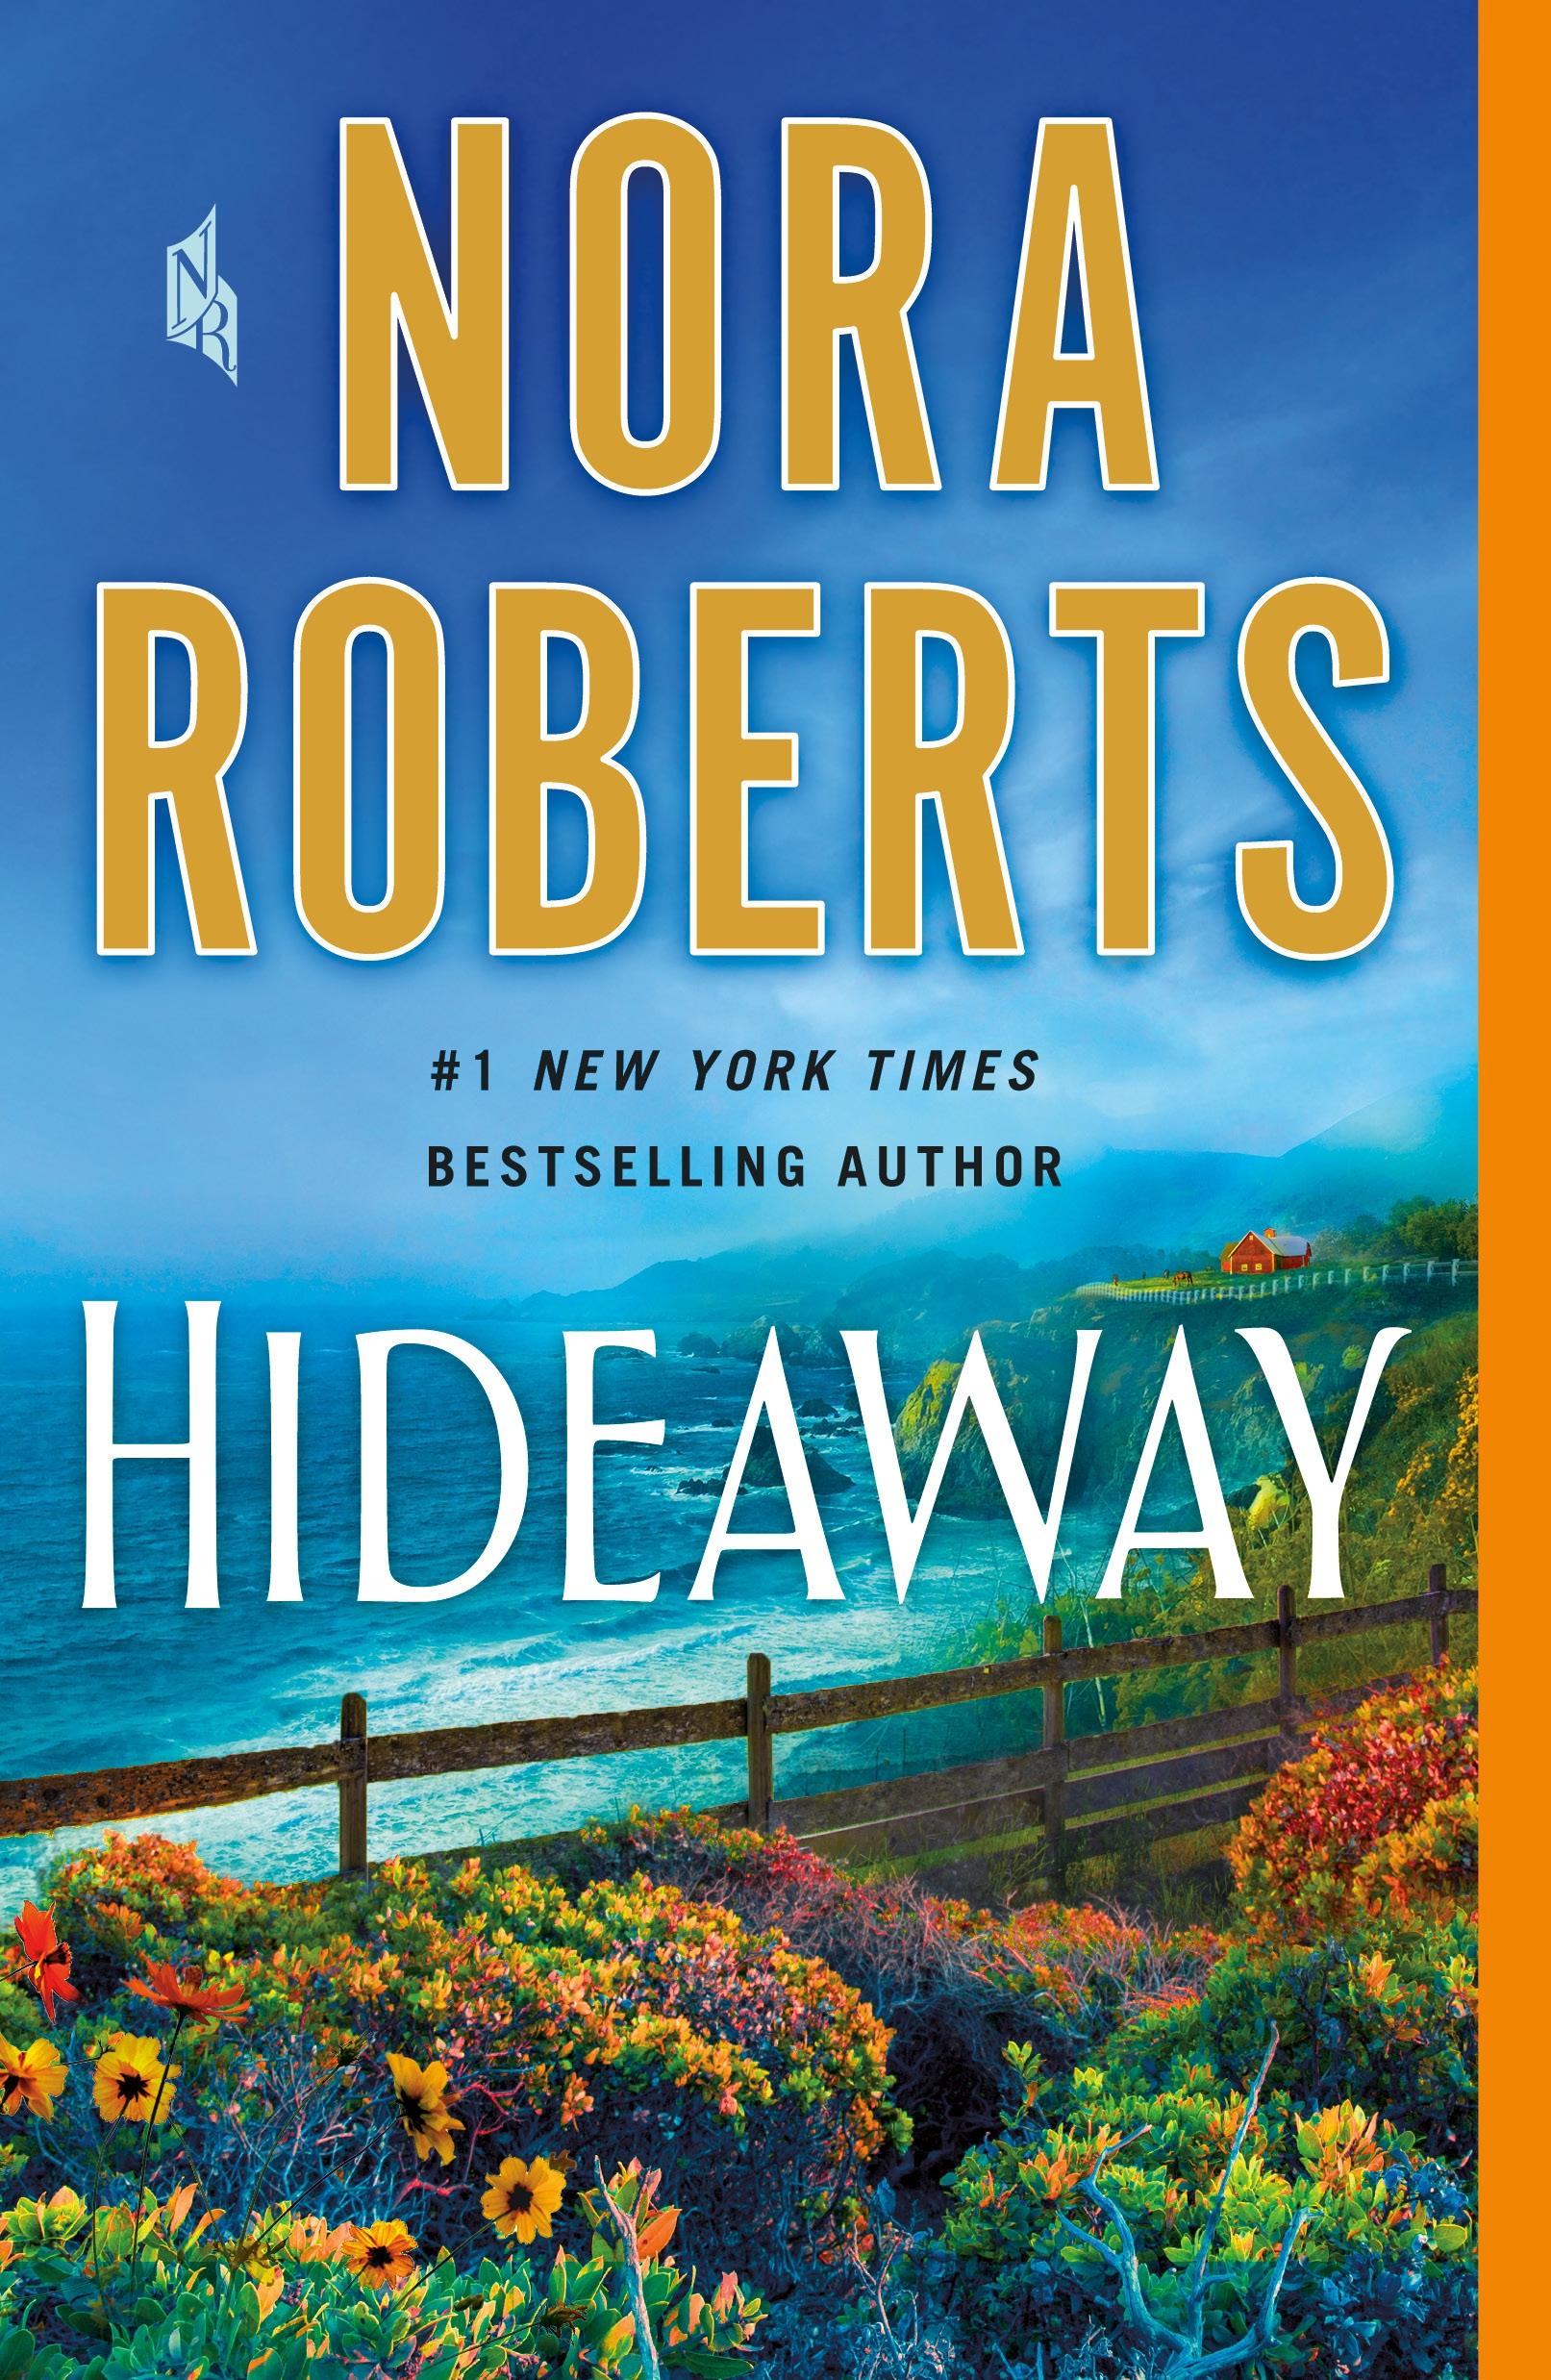 Hideaway [electronic resource] : A Novel